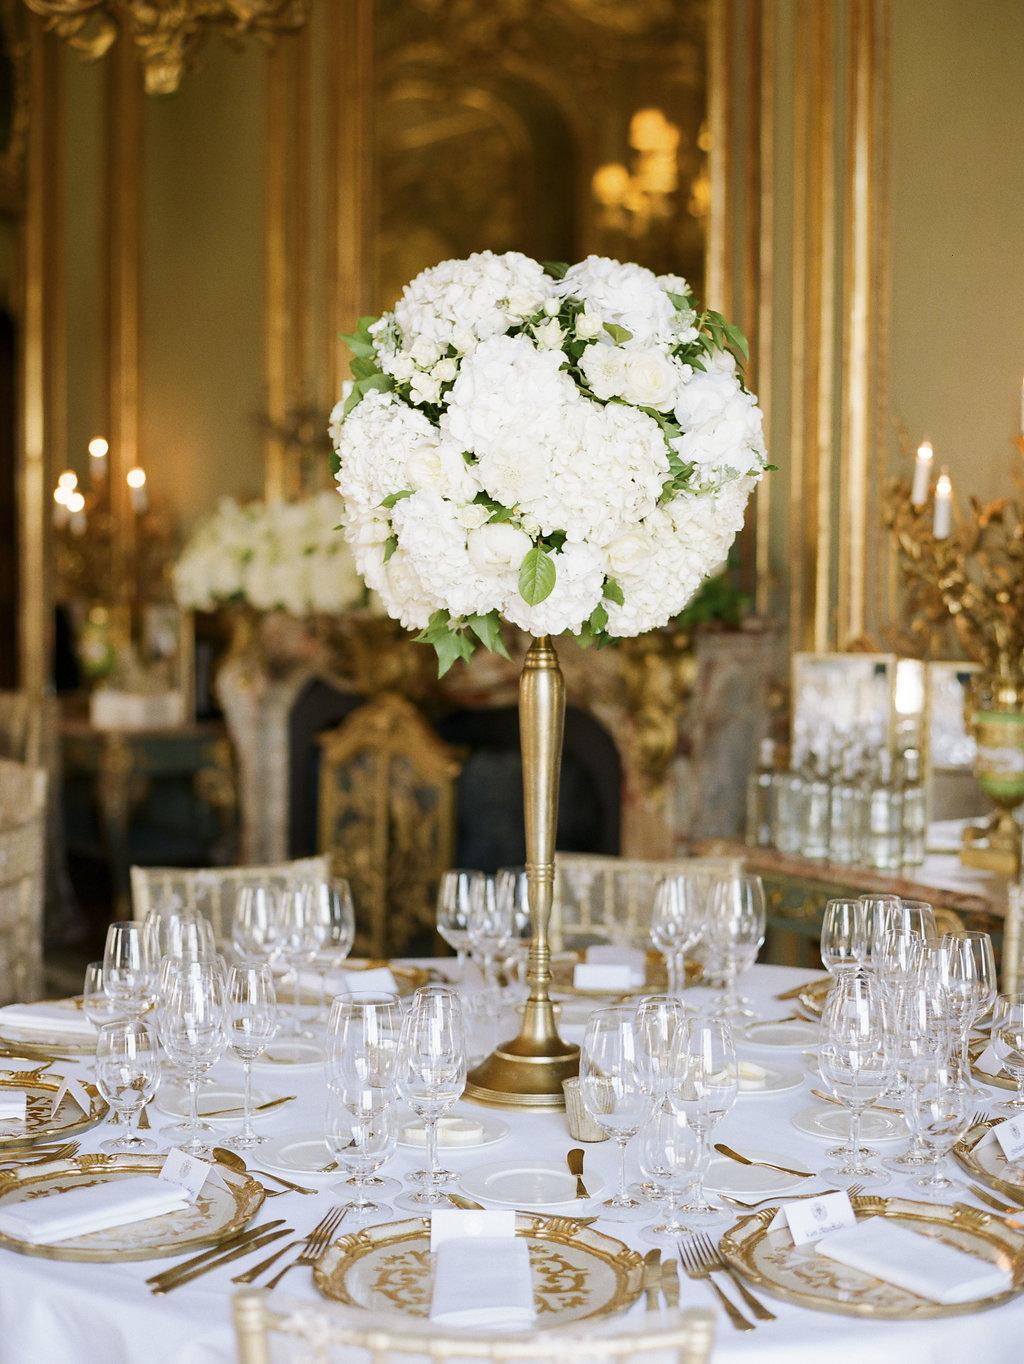 Cliveden Joanna Carter Wedding Flowers Buckinghamshire Oxfordshire Berkshire London_1233